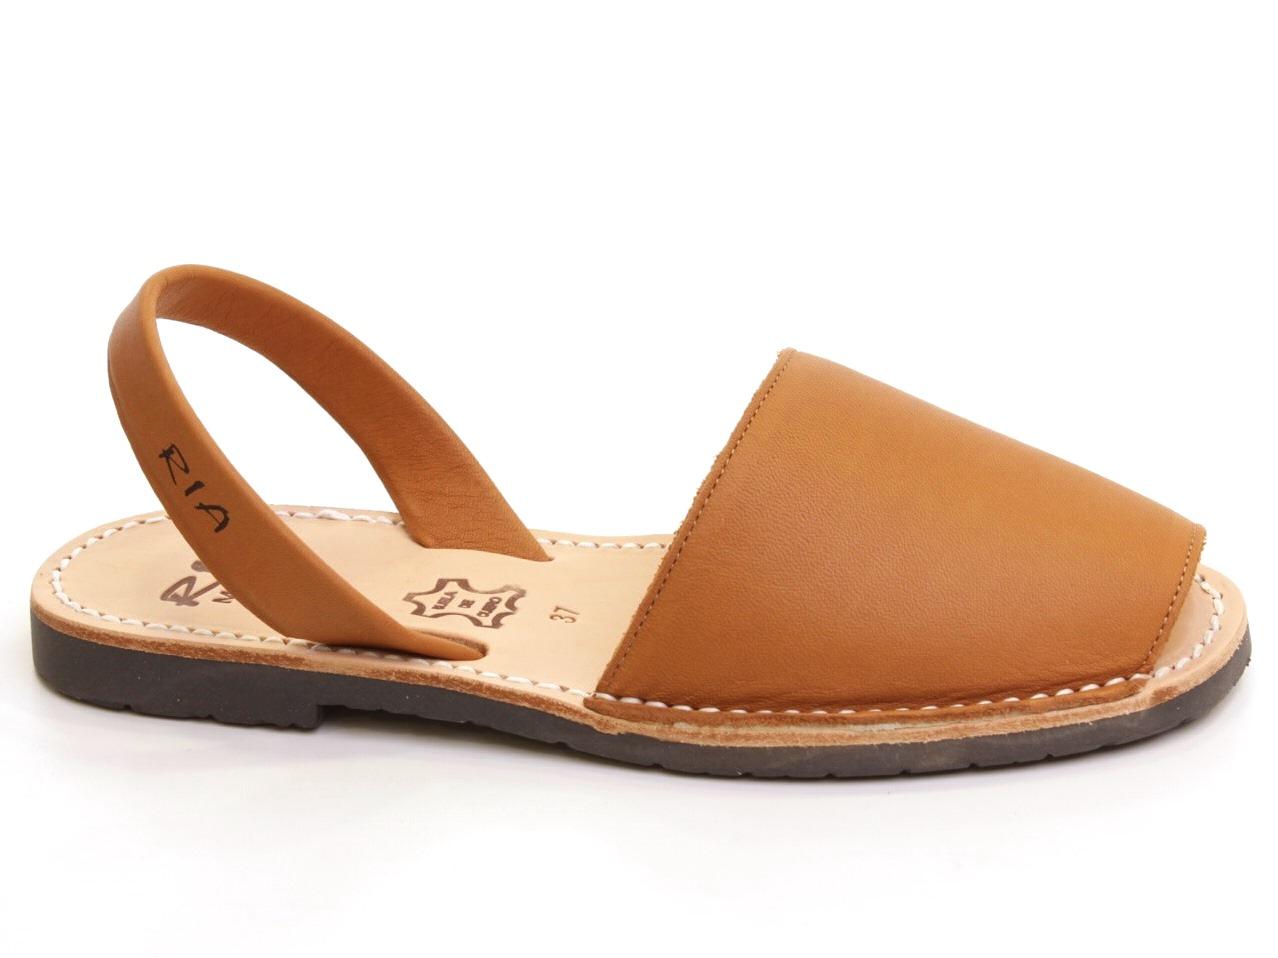 Sandales Plates Ria Menorca - 489 20002 S2